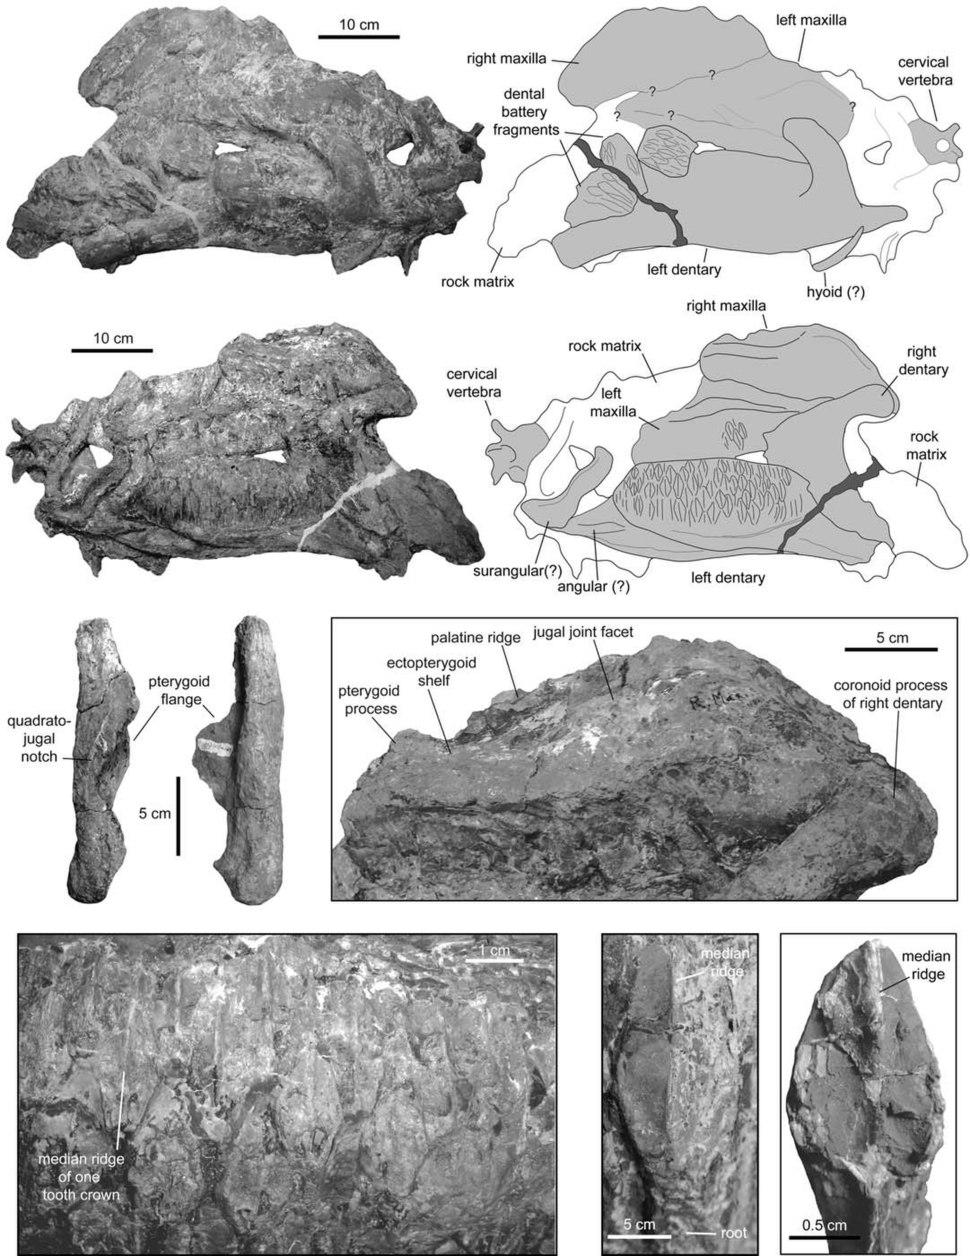 Augustynolophus favcial and mandubular elements